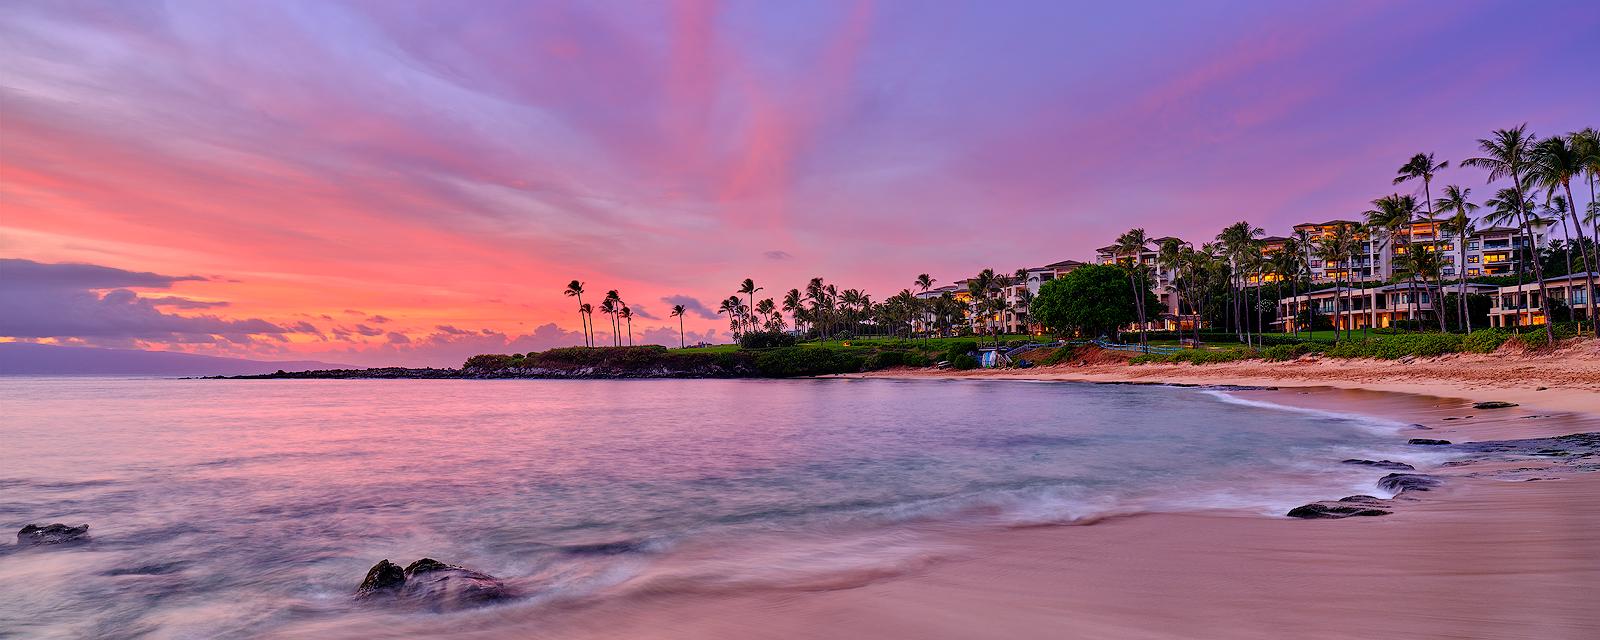 a beautiful sunset panorama at Kapalua Bay Beach on the island of Maui, Hawaii.  Fine art Hawaii photography prints by artist Andrew Shoemaker